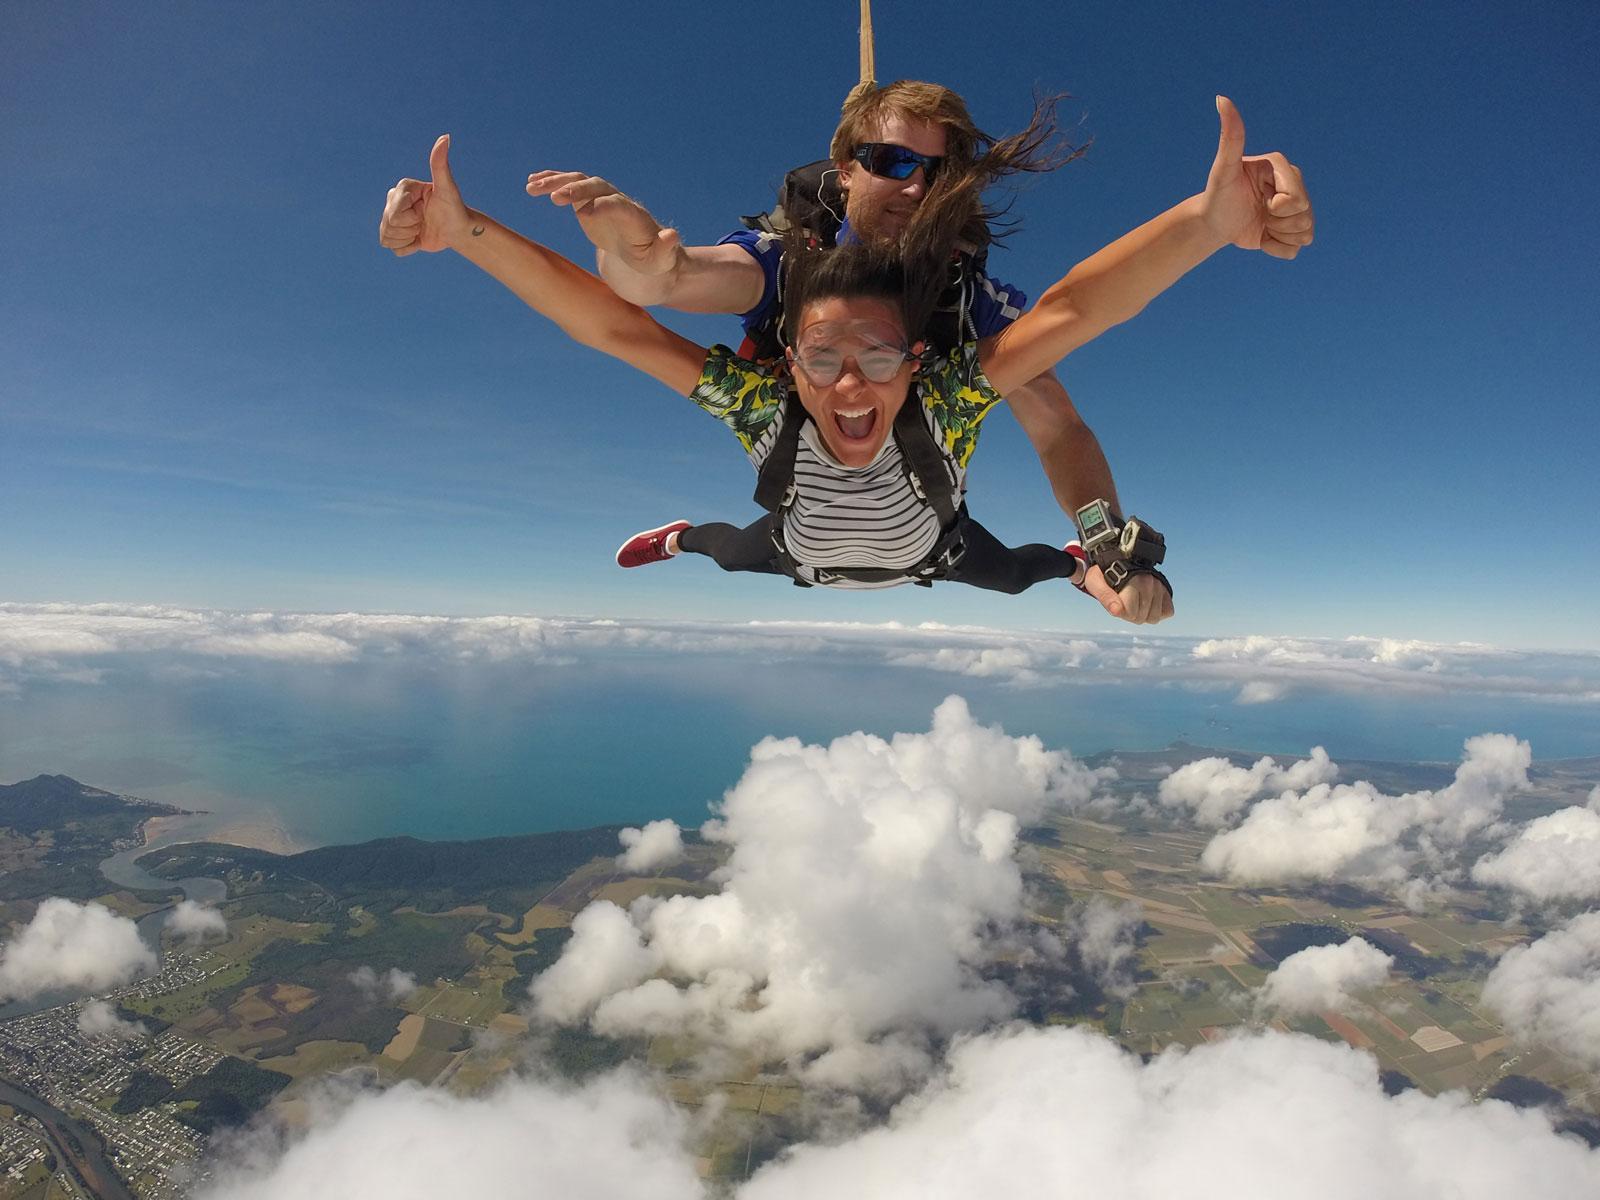 Tandem Skydive 7,000ft